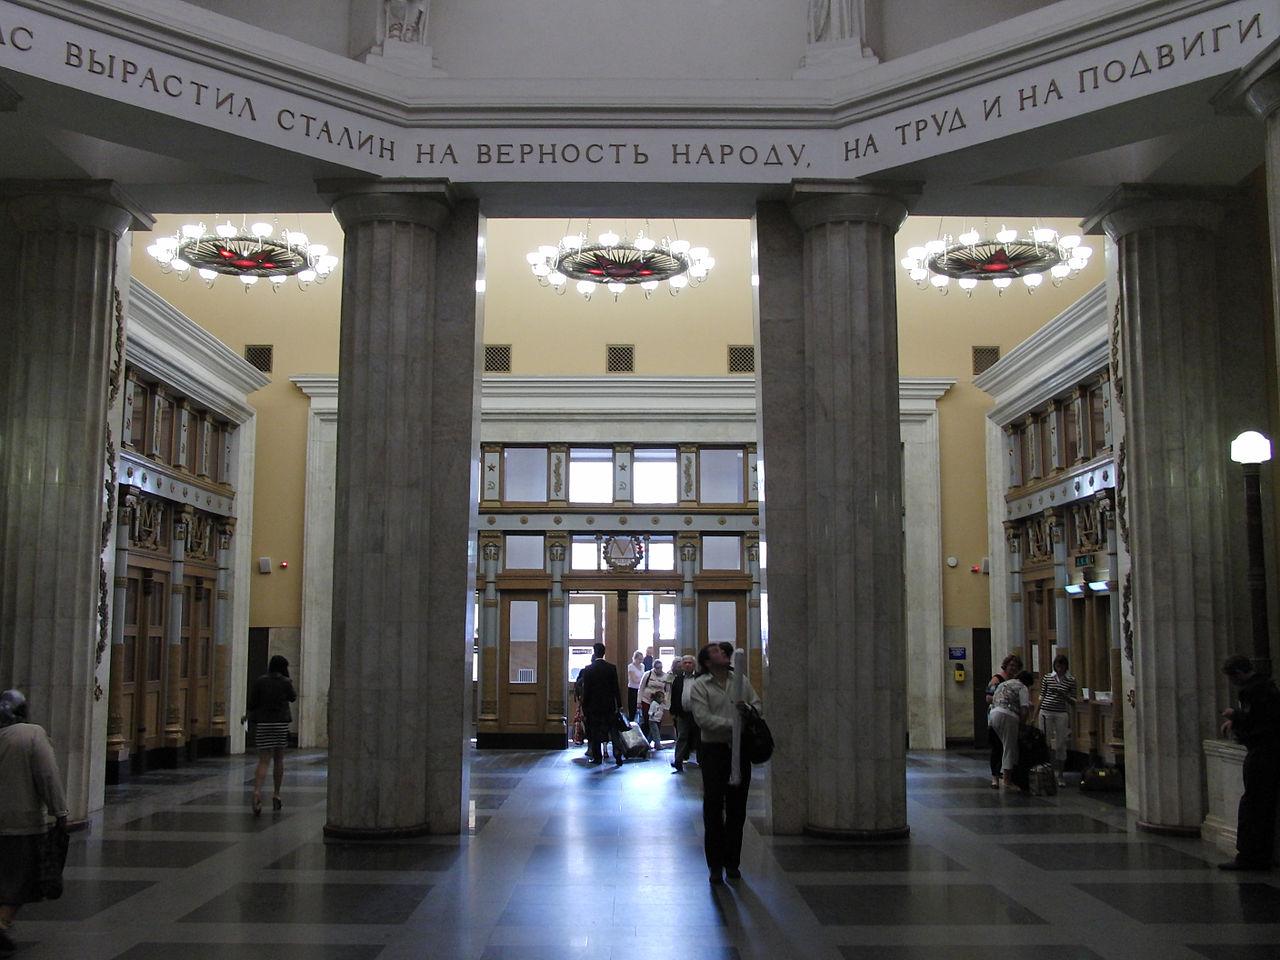 38 класVestibule_of_Kurskaya_stations_(Вестибюль_станций_Курская)_(5007558881).jpg